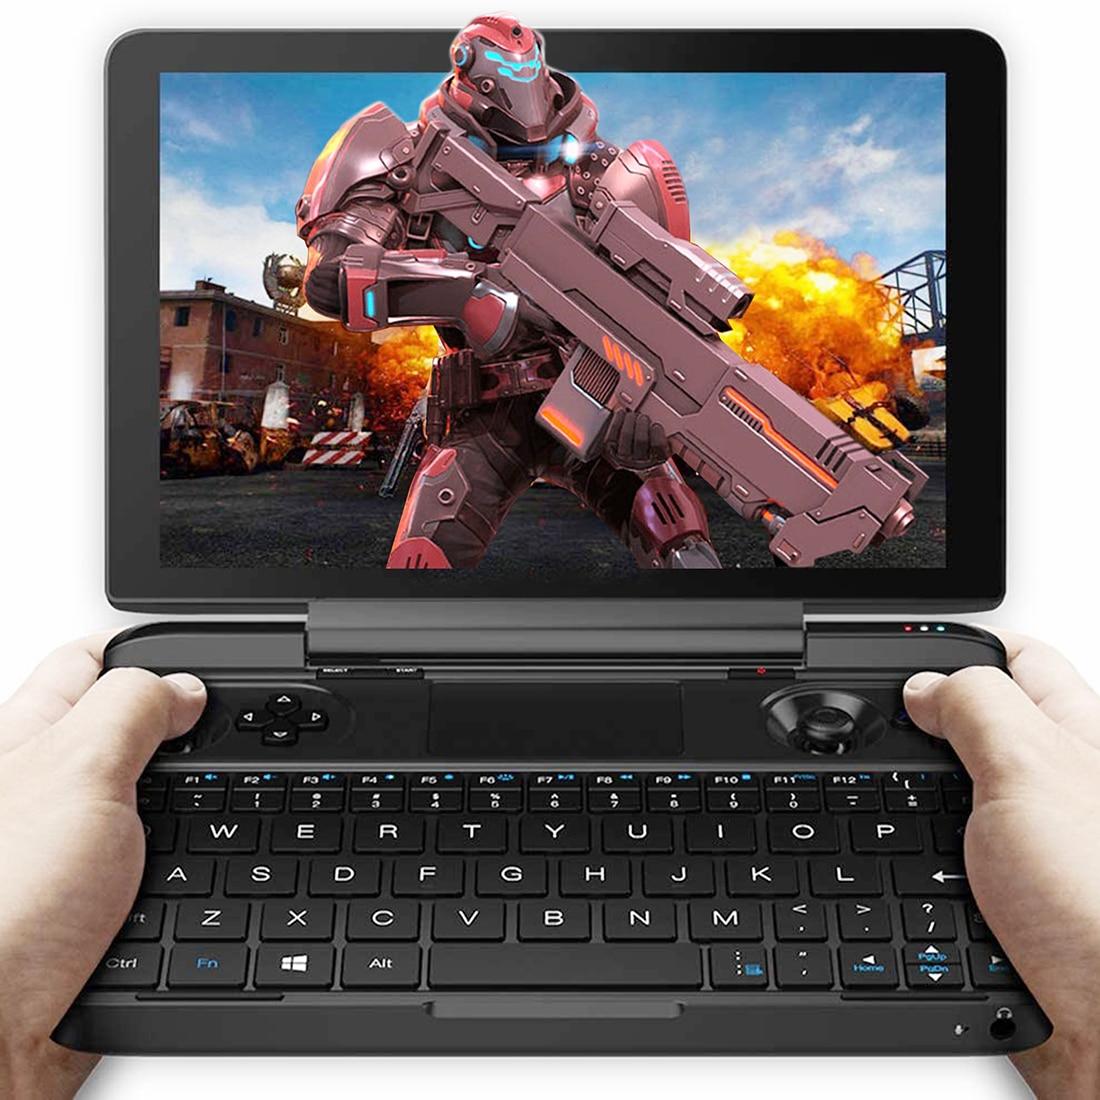 GPD WIN MAX 8.0 بوصة يده لعبة لاعب الفيديو وحدة المعالجة المركزية إنتل كور i5 مفكرة صغيرة محمول اجهزة اللعبة الالكترونية المحمولة